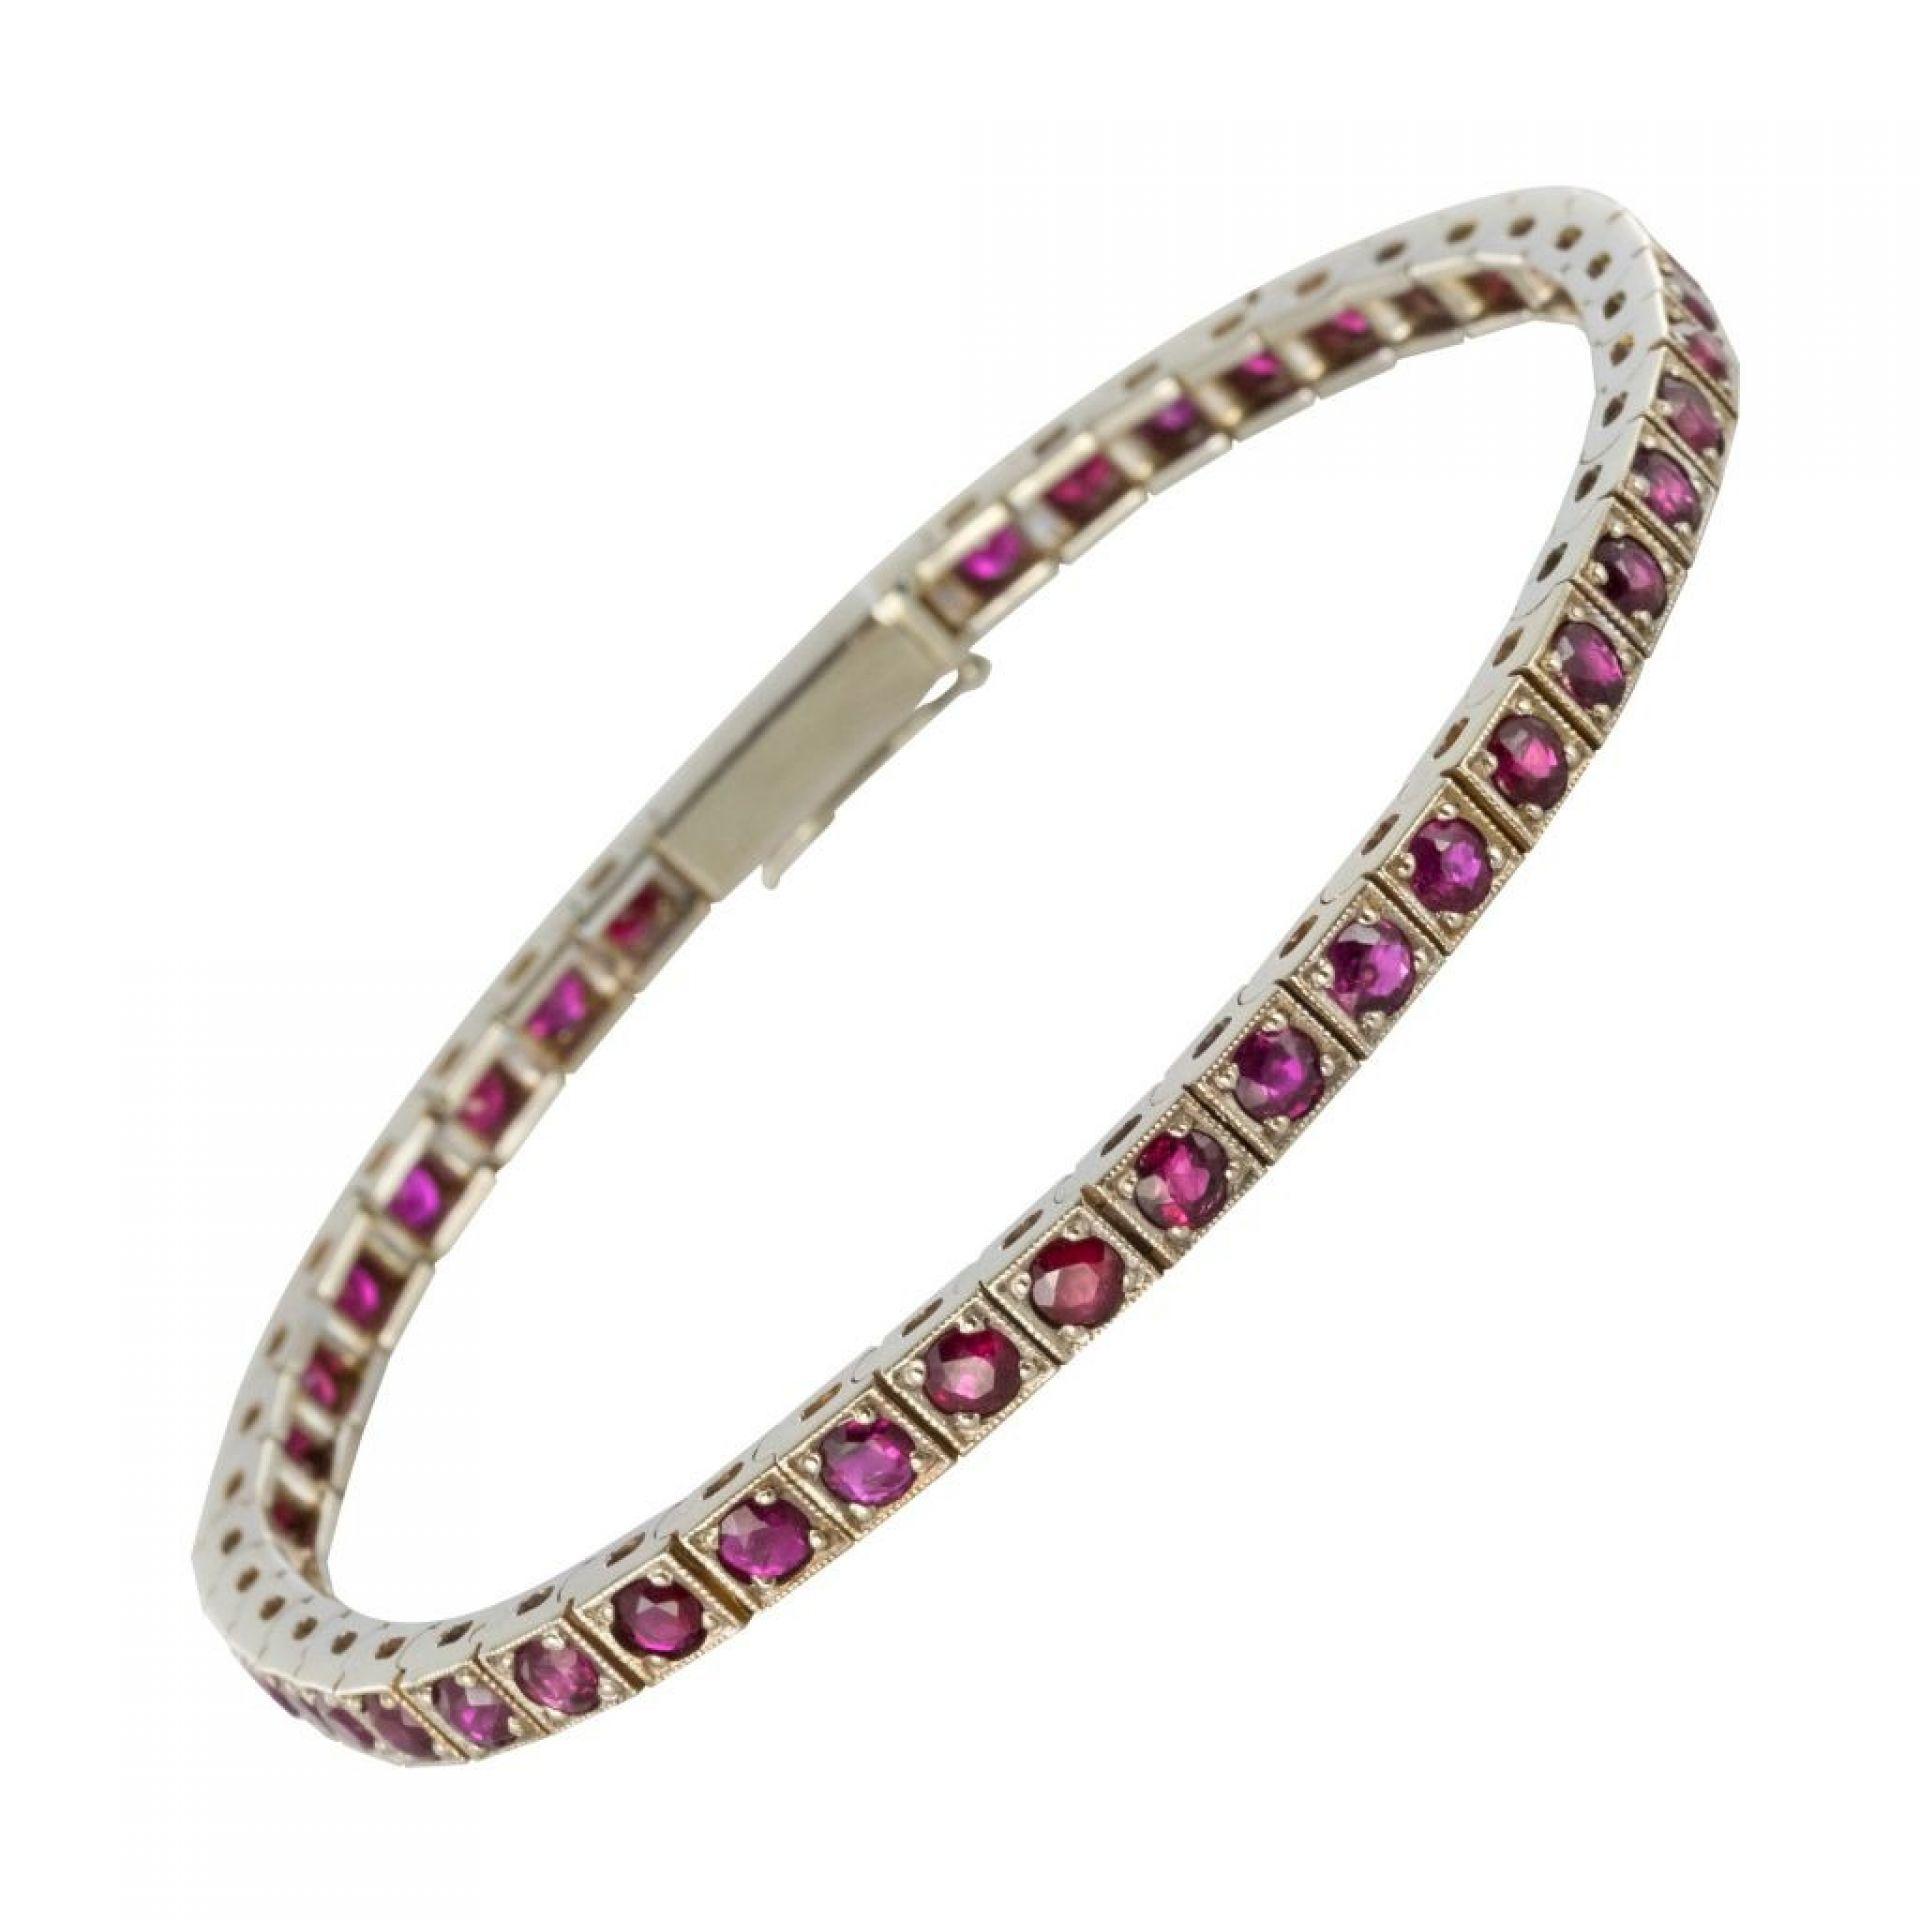 White gold ruby bracelet